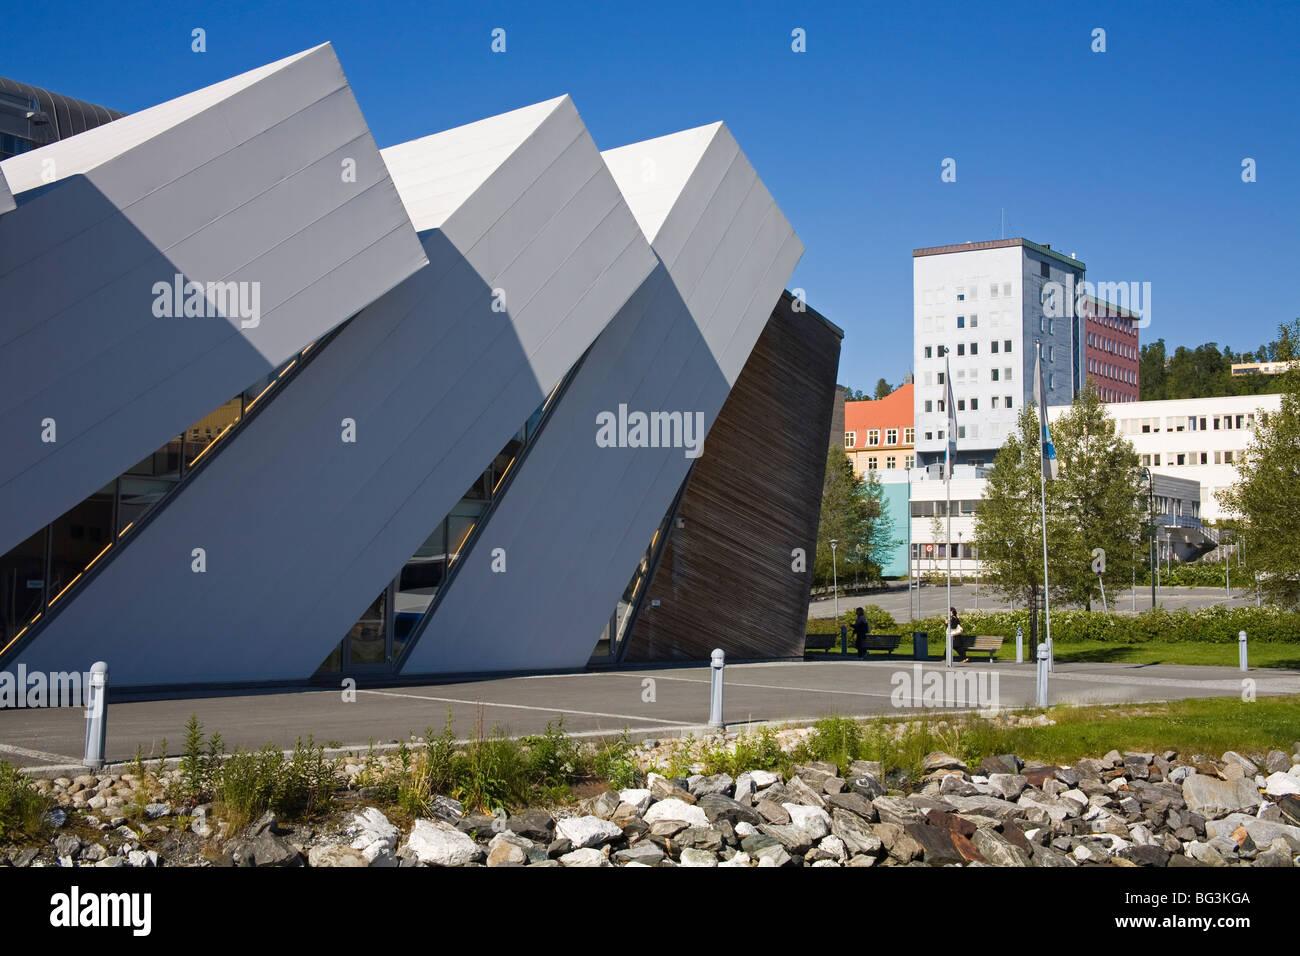 Polaria Museum, Tromso City, Troms County, Norway, Scandinavia, Europe Stock Photo